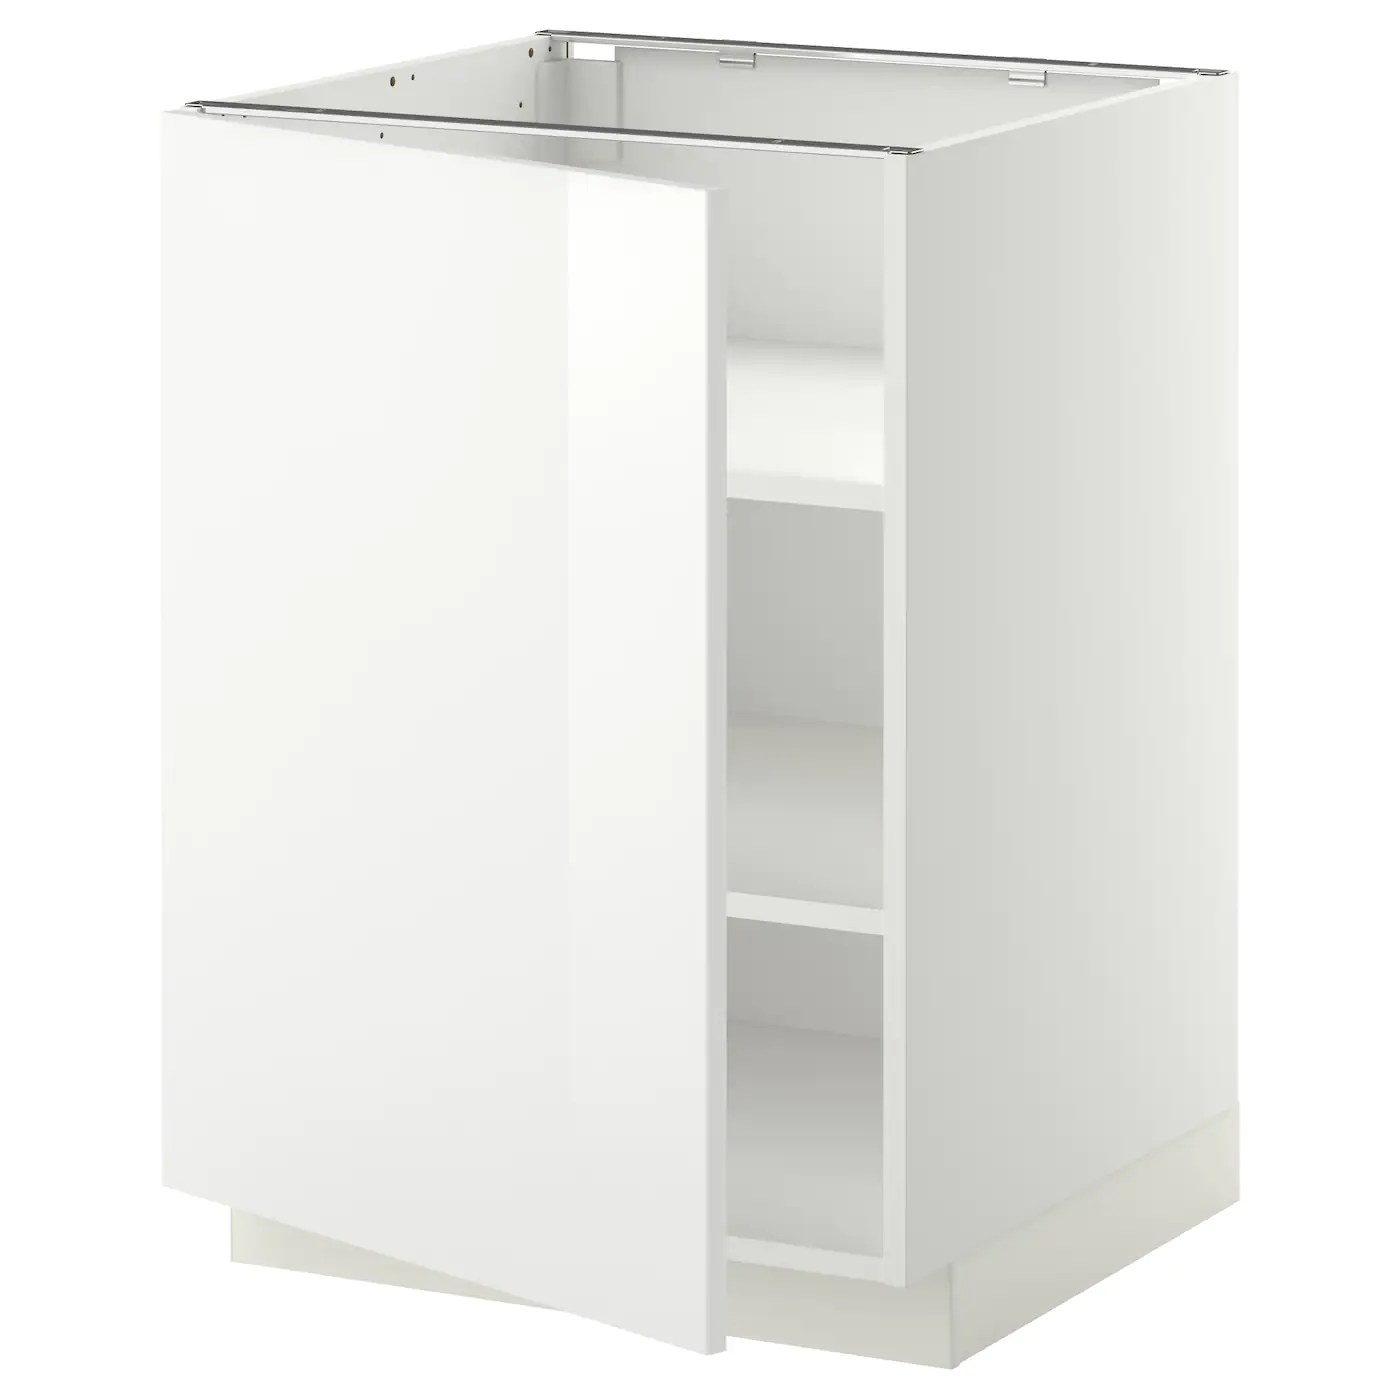 Meubles Bas Cuisine Systeme Metod Ikea